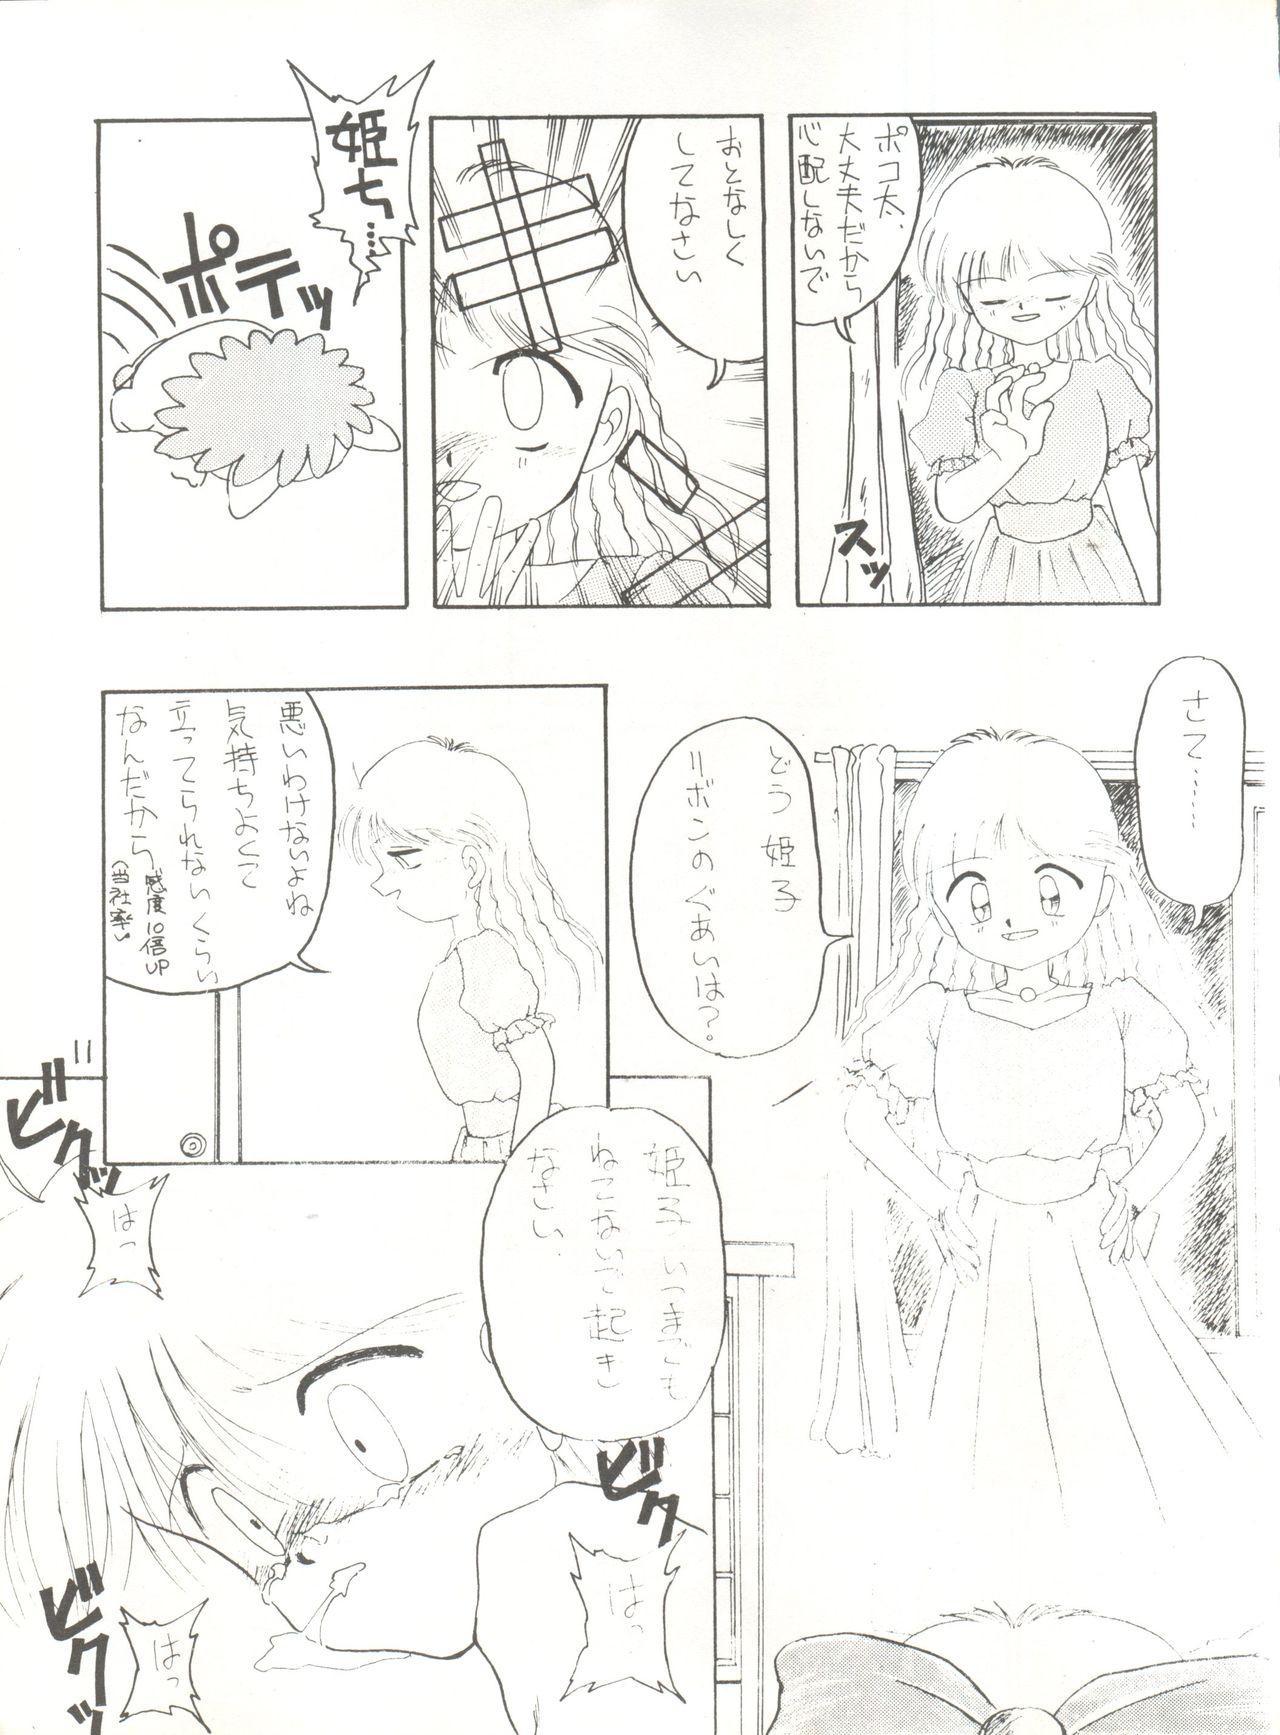 [Global One (MARO)] Sadistic 5 (Cutey Honey, Devilman, Sailor Moon), [Global One (MARO)] Sadistic (Dirty Pair, Fushigi no Umi no Nadia, Sailor Moon), [Studio Ikkatsumajin] .ribbon (Hime-chan's Ribbon) 134